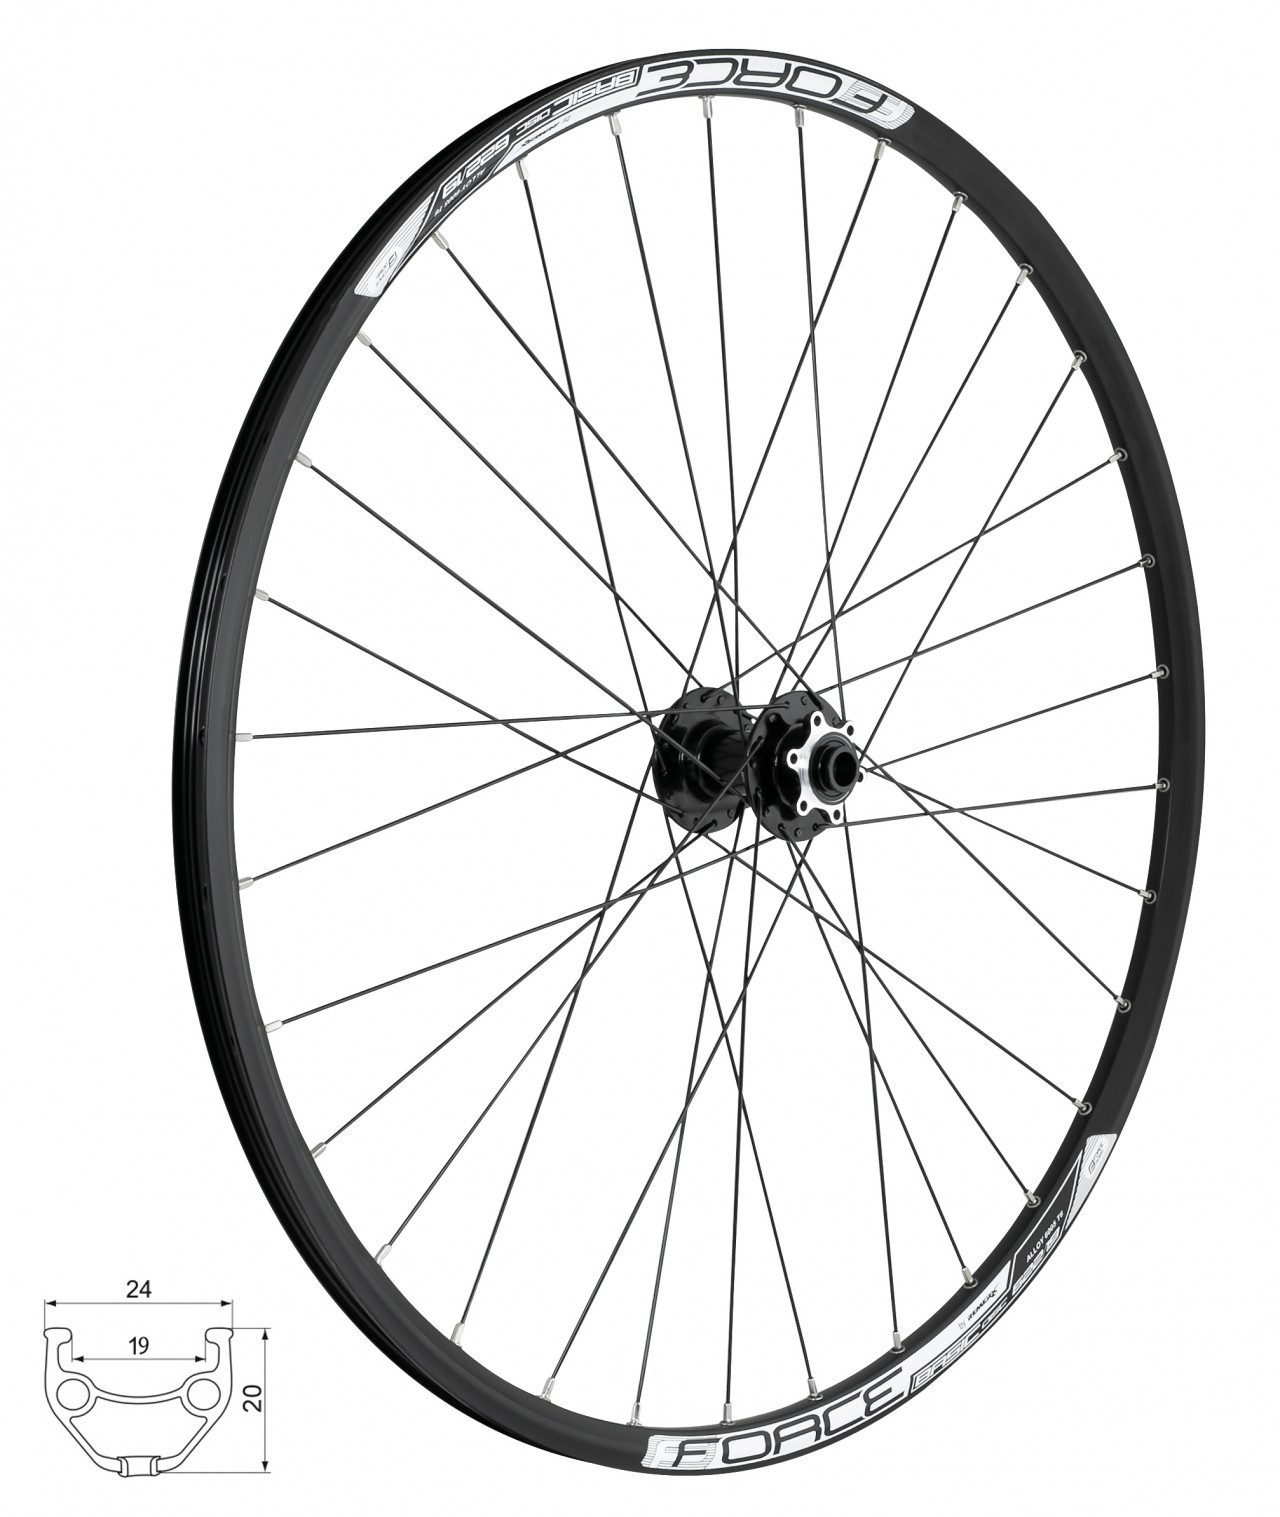 FORCE koleso predné BASIC DISC 622x19, F804505, 6d / 15, 32d